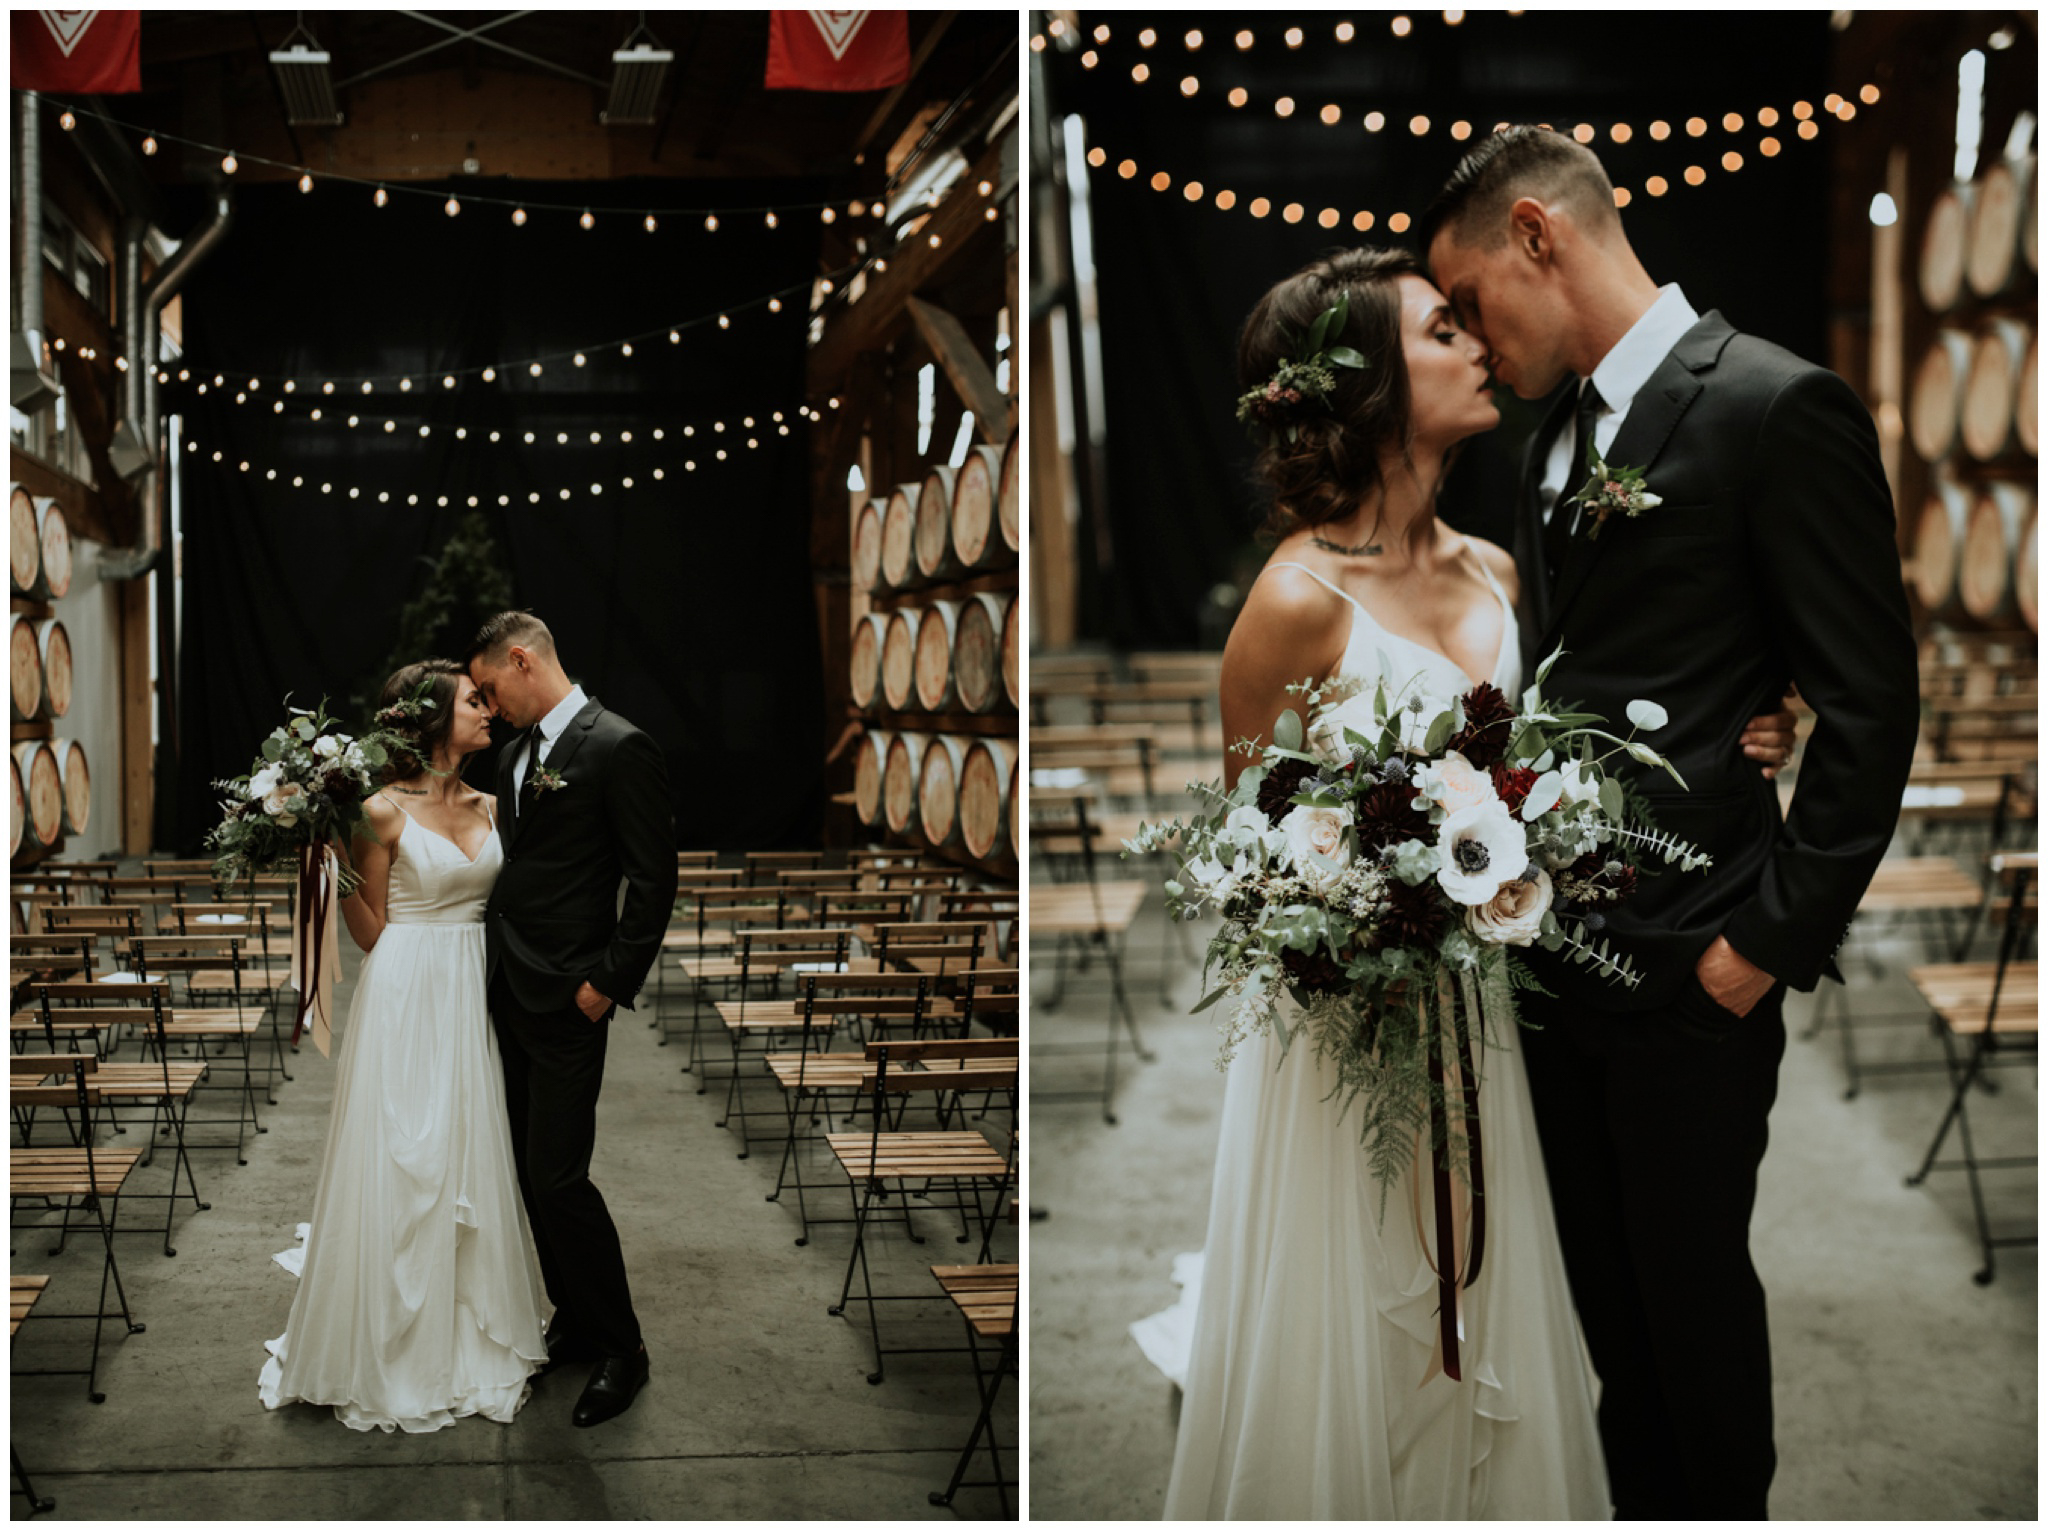 alyssa-keiran-westland-distillery-urban-seattle-wedding-photographer-caitlyn-nikula-91.jpg